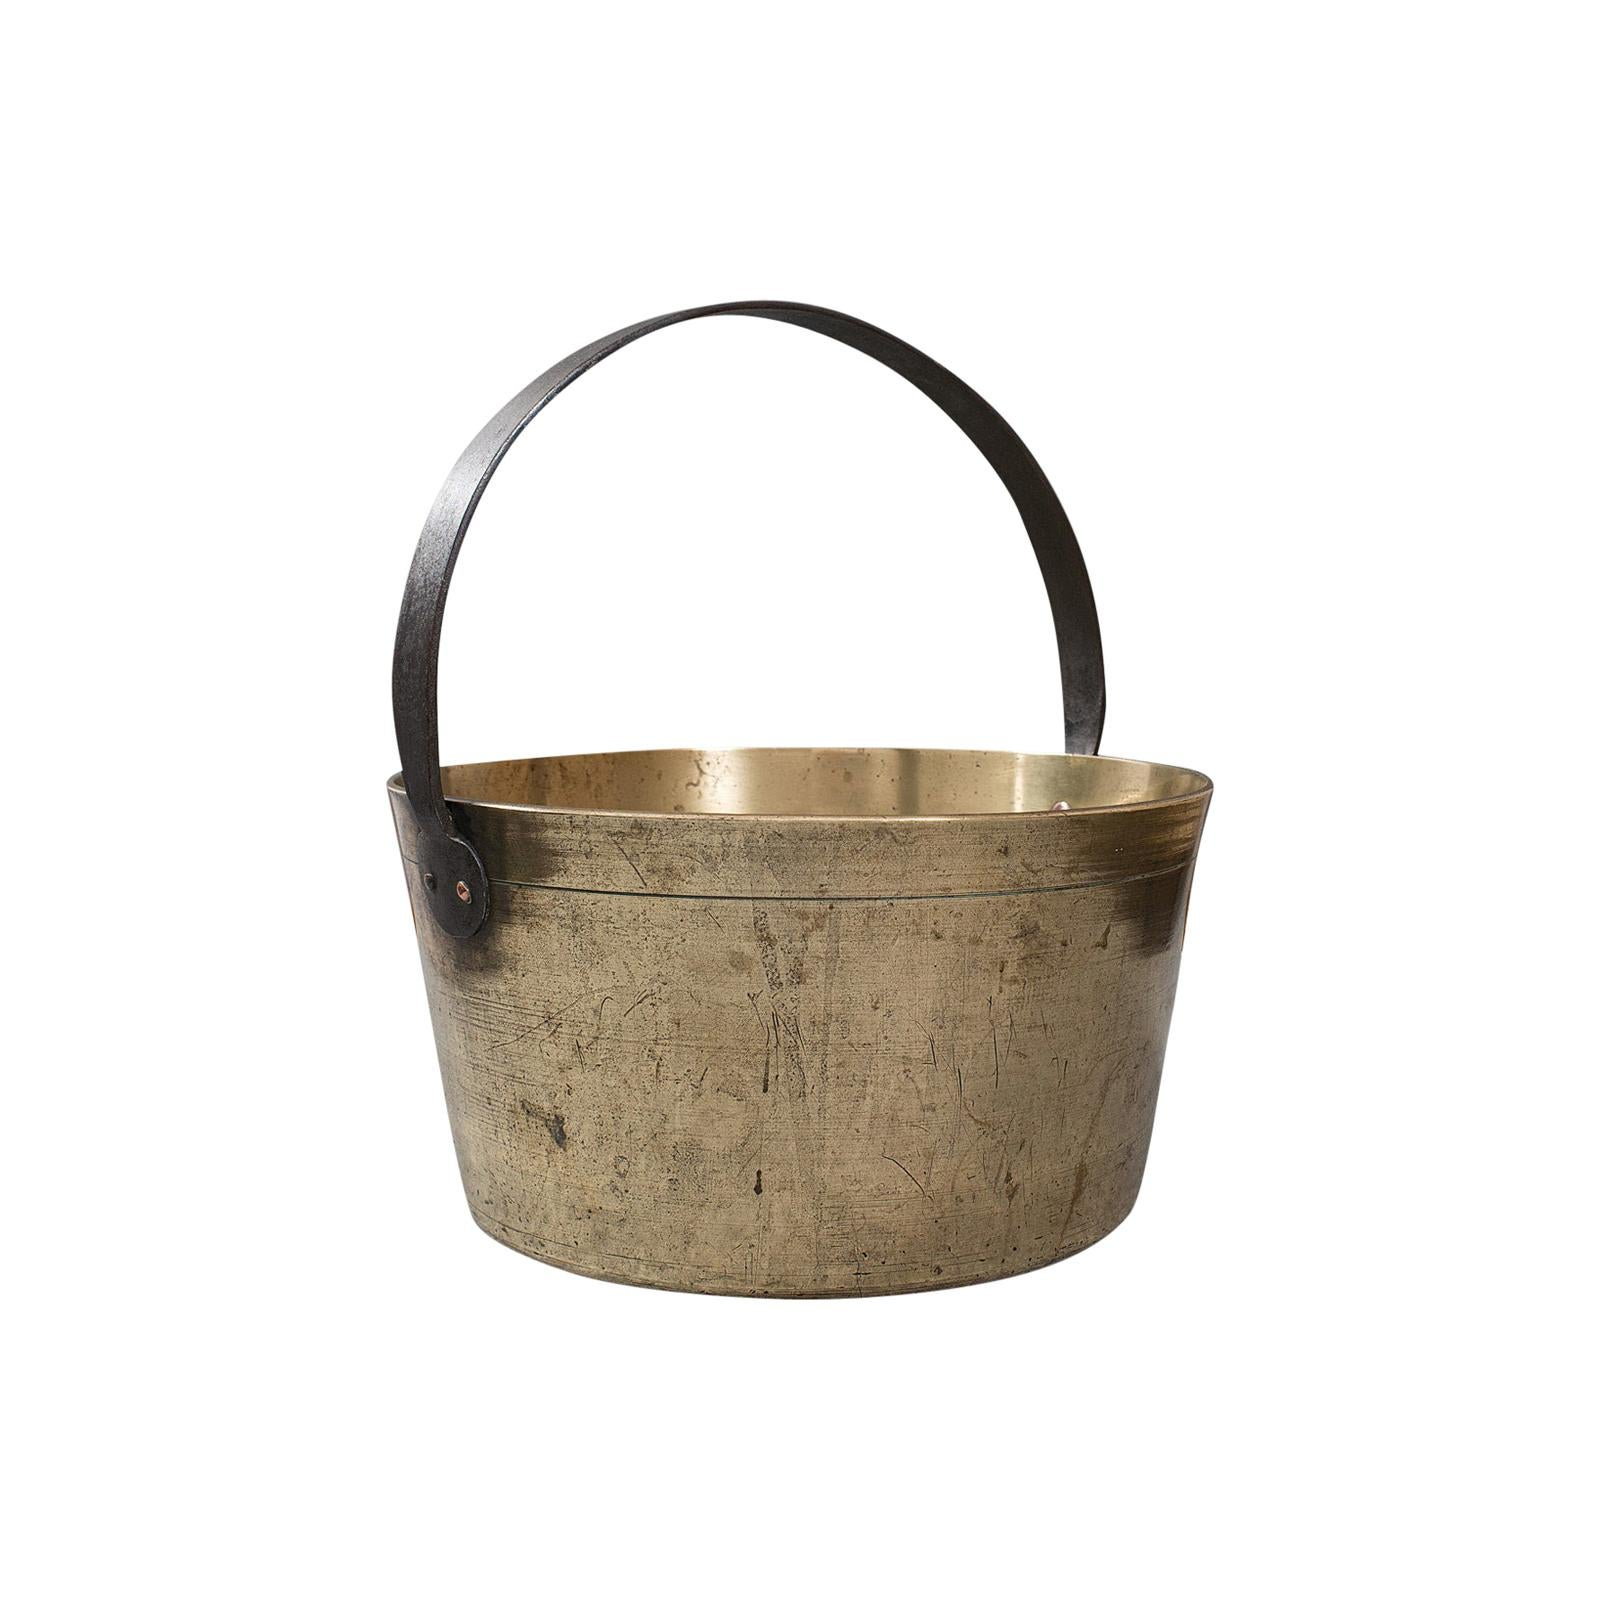 Heavy Antique Jam Pan, English, Brass, Preserve, Cooking Pot, Georgian, C.1800